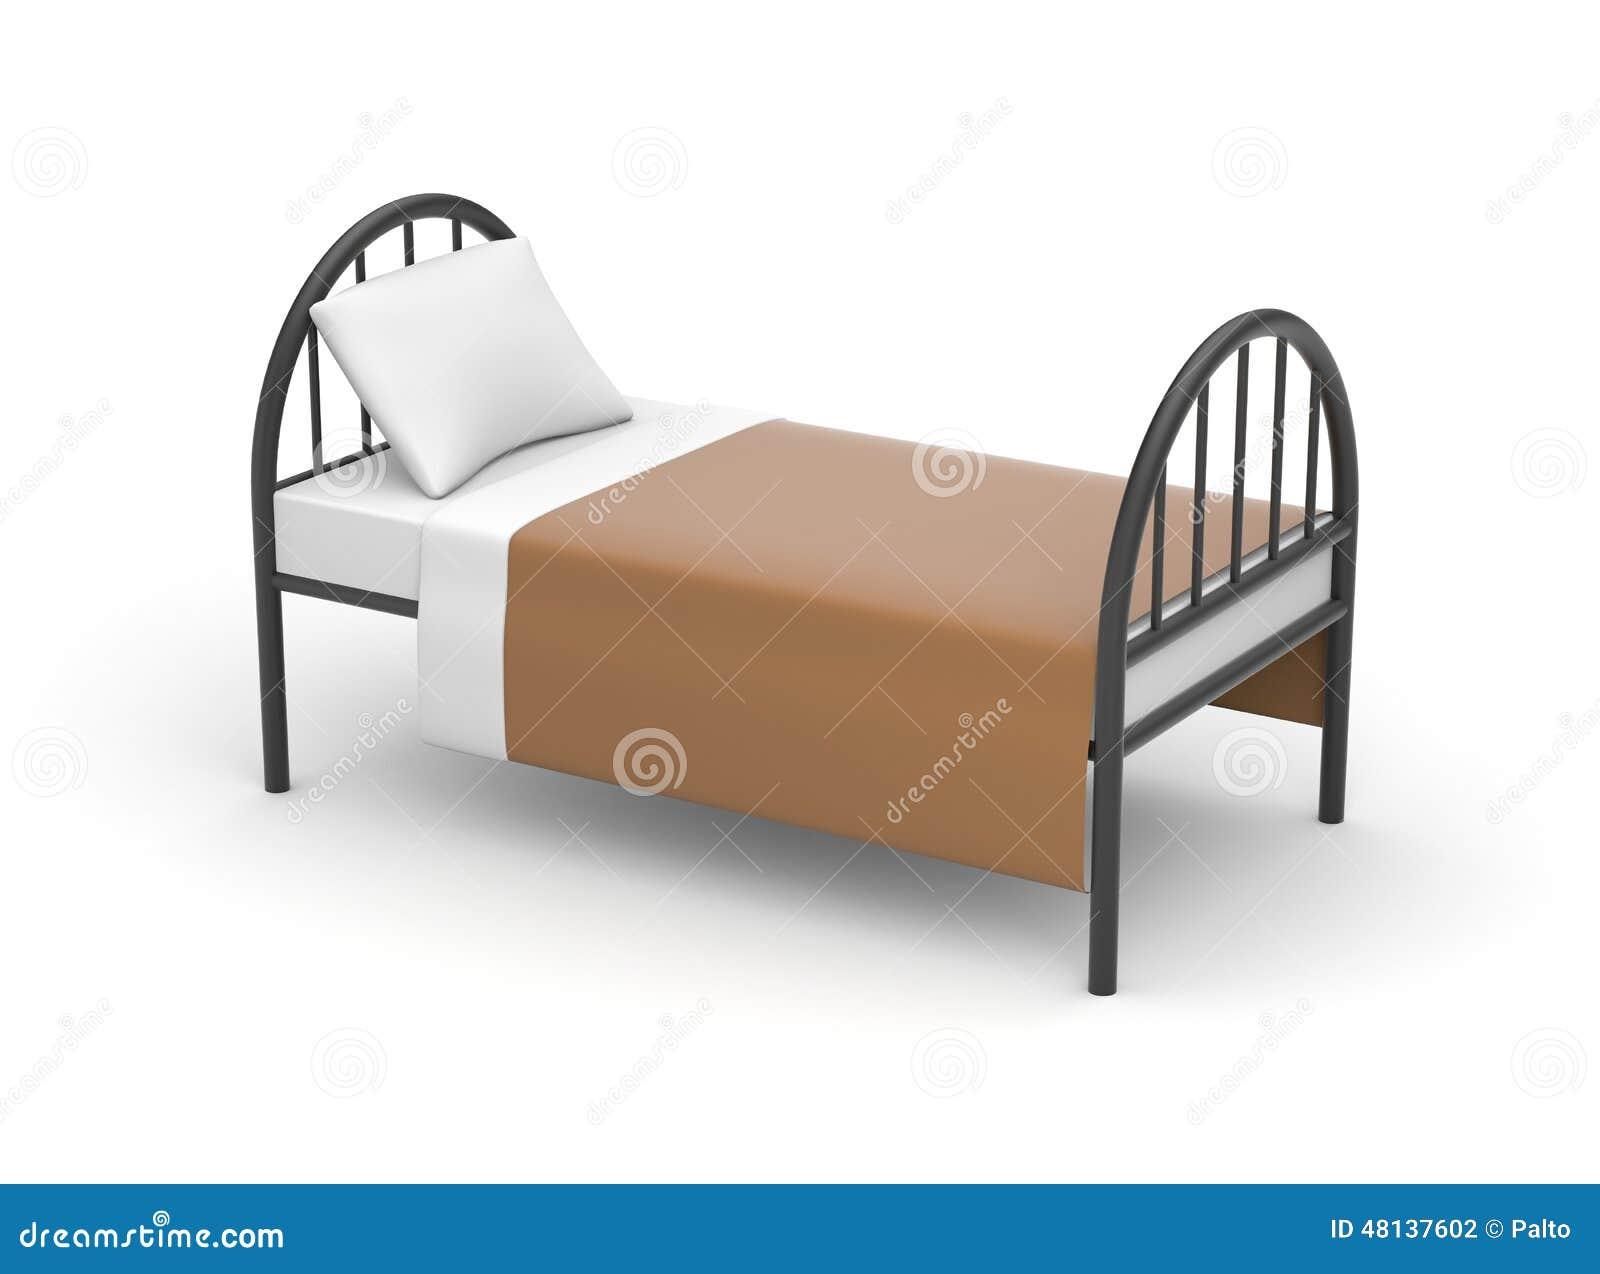 einfaches bett stock abbildung bild 48137602. Black Bedroom Furniture Sets. Home Design Ideas